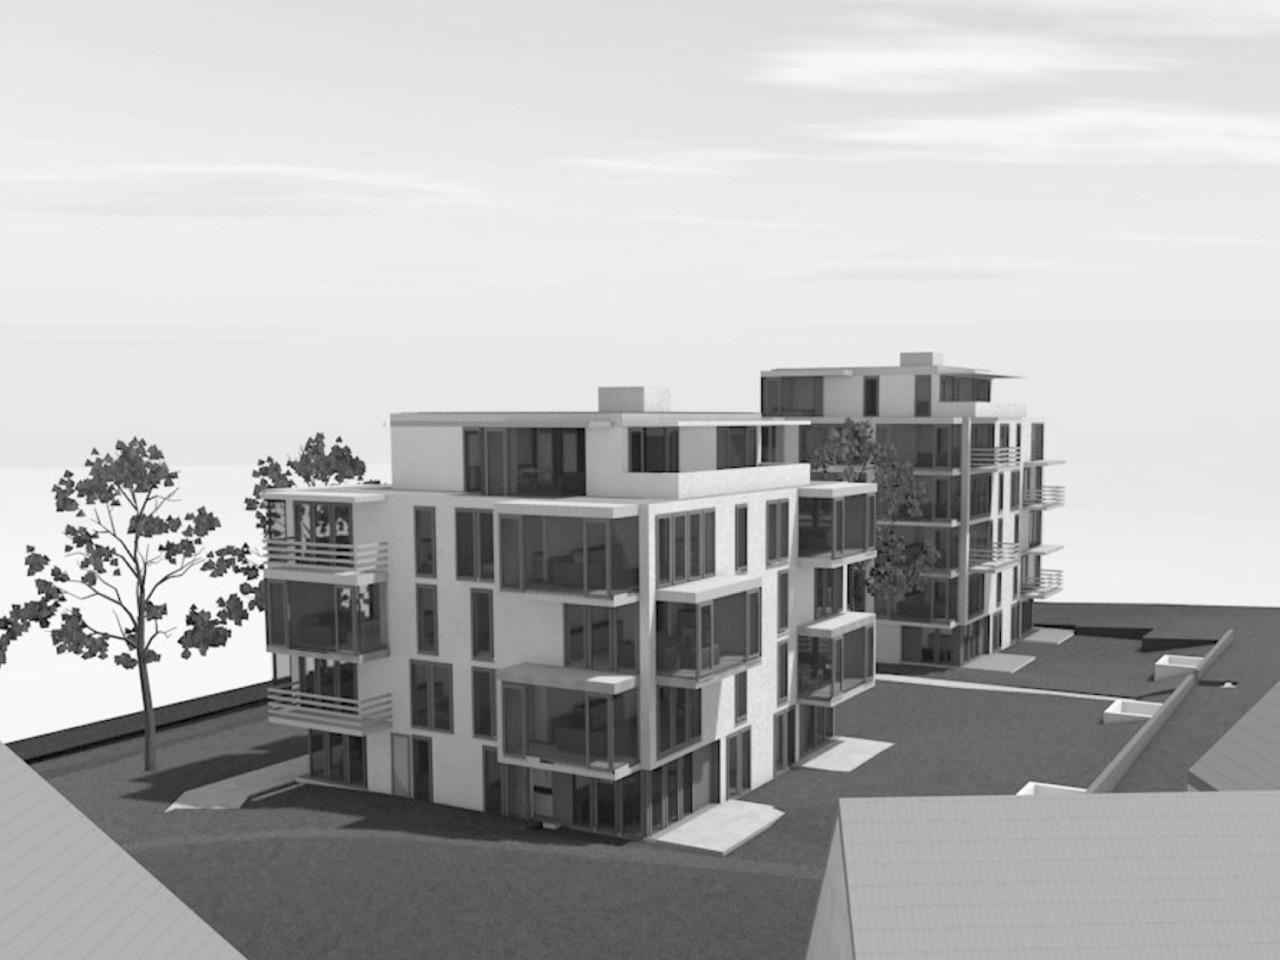 burkhardt-architekten.de »LFT« Wohnbau